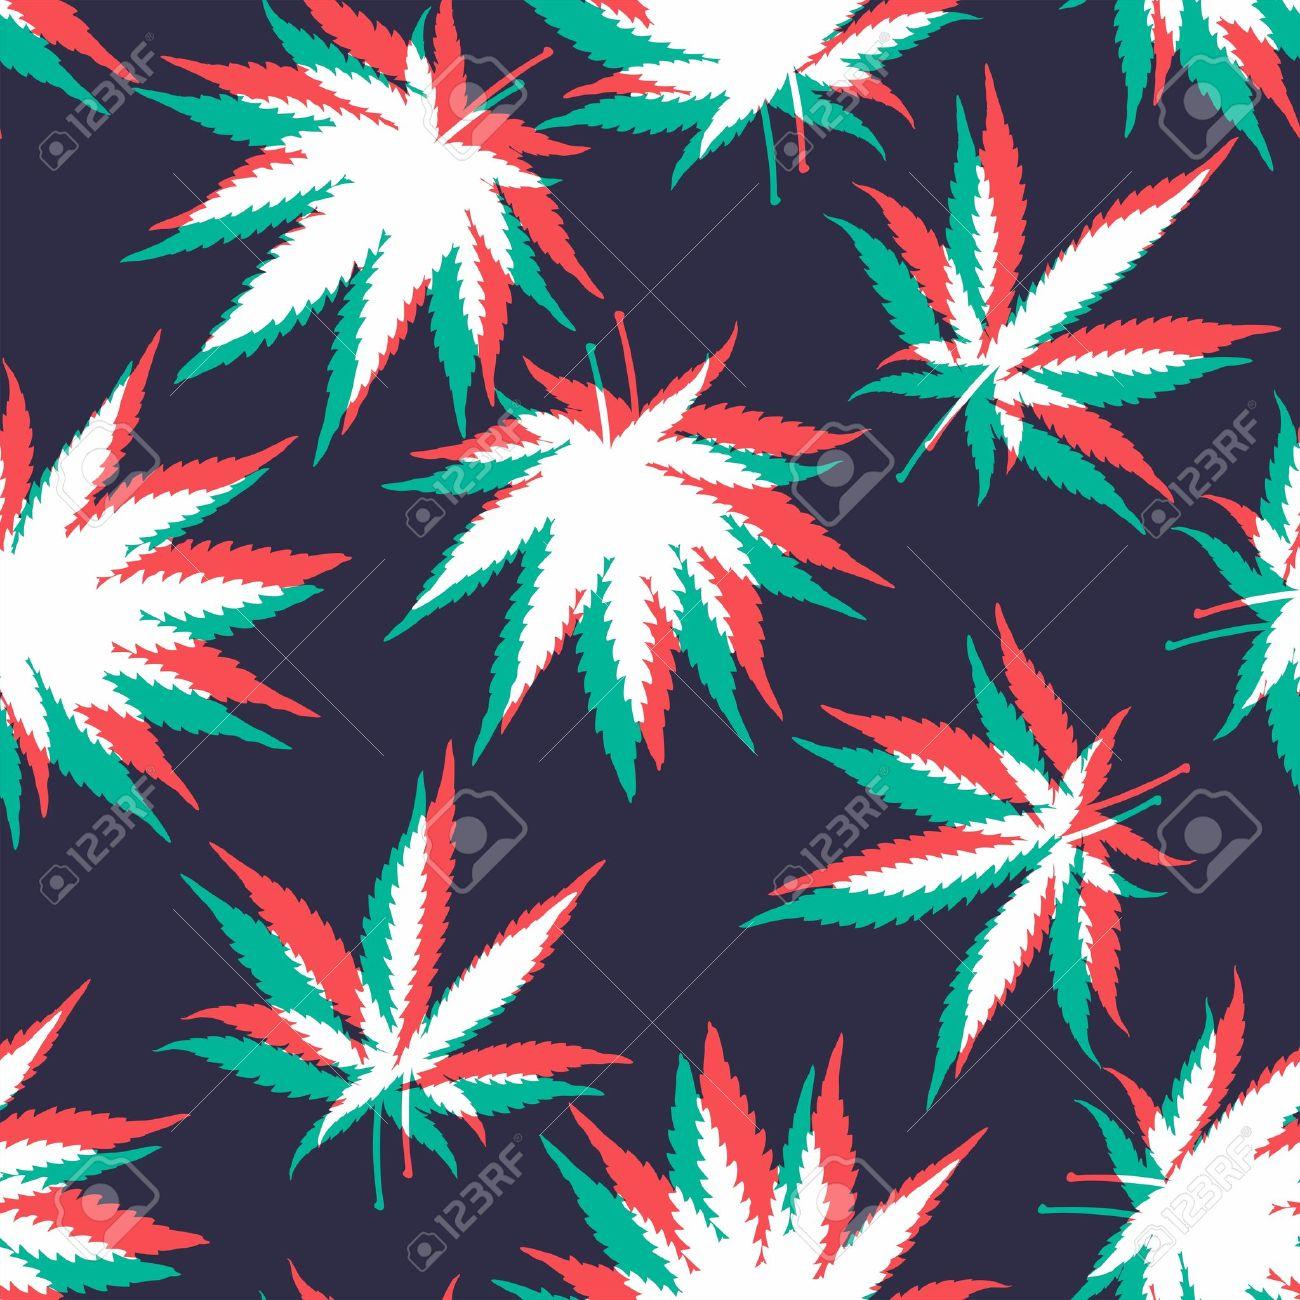 Ganja Weed Marijuana Seamless Vector Pattern Background Royalty Free Cliparts Vectors And Stock Illustration Image 49353009